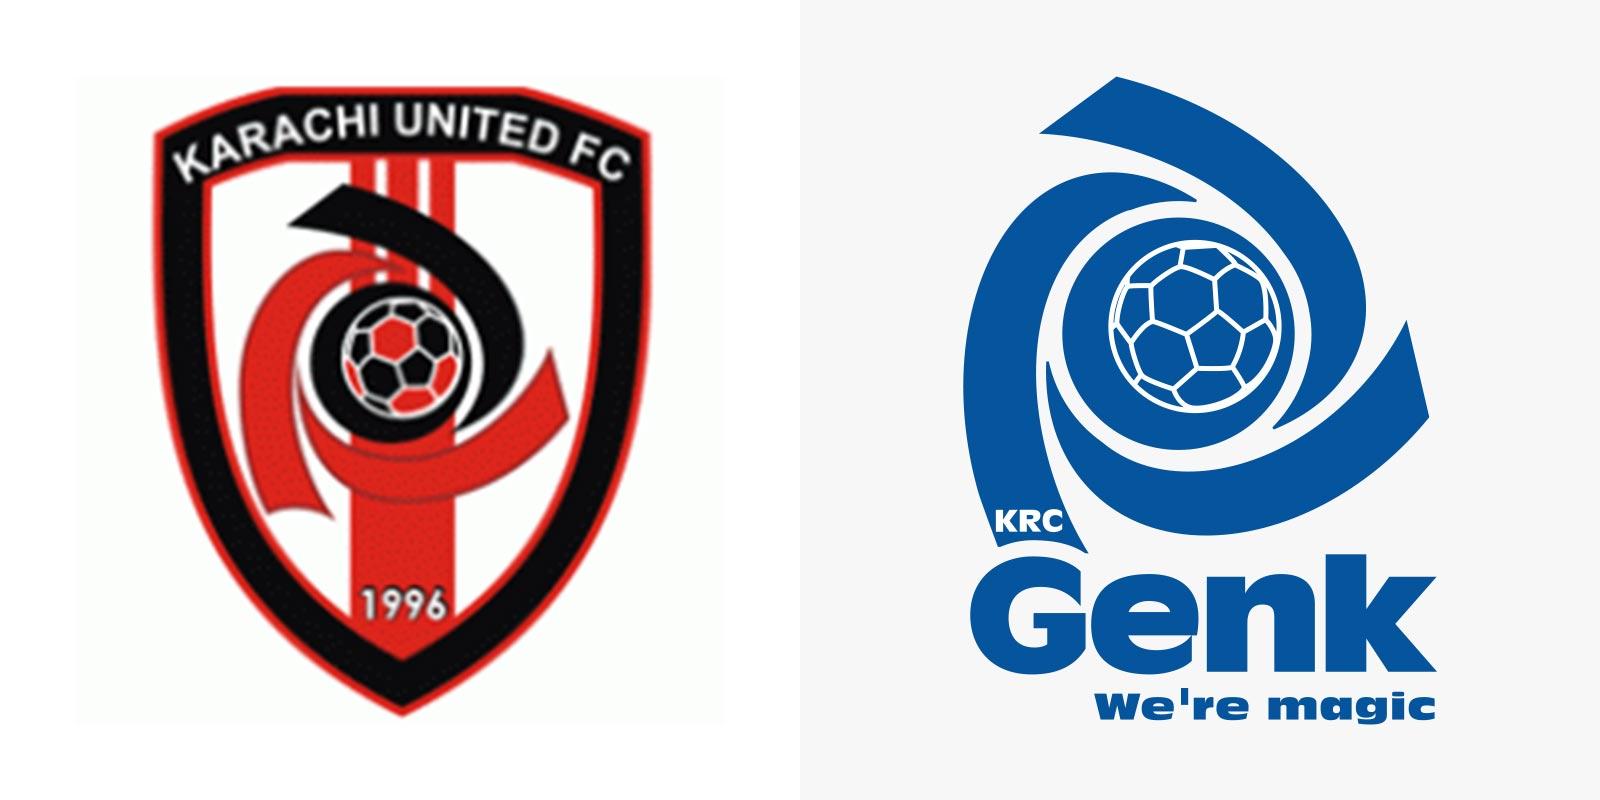 KRC Genk (старый) - Karachi United (Пакистан)